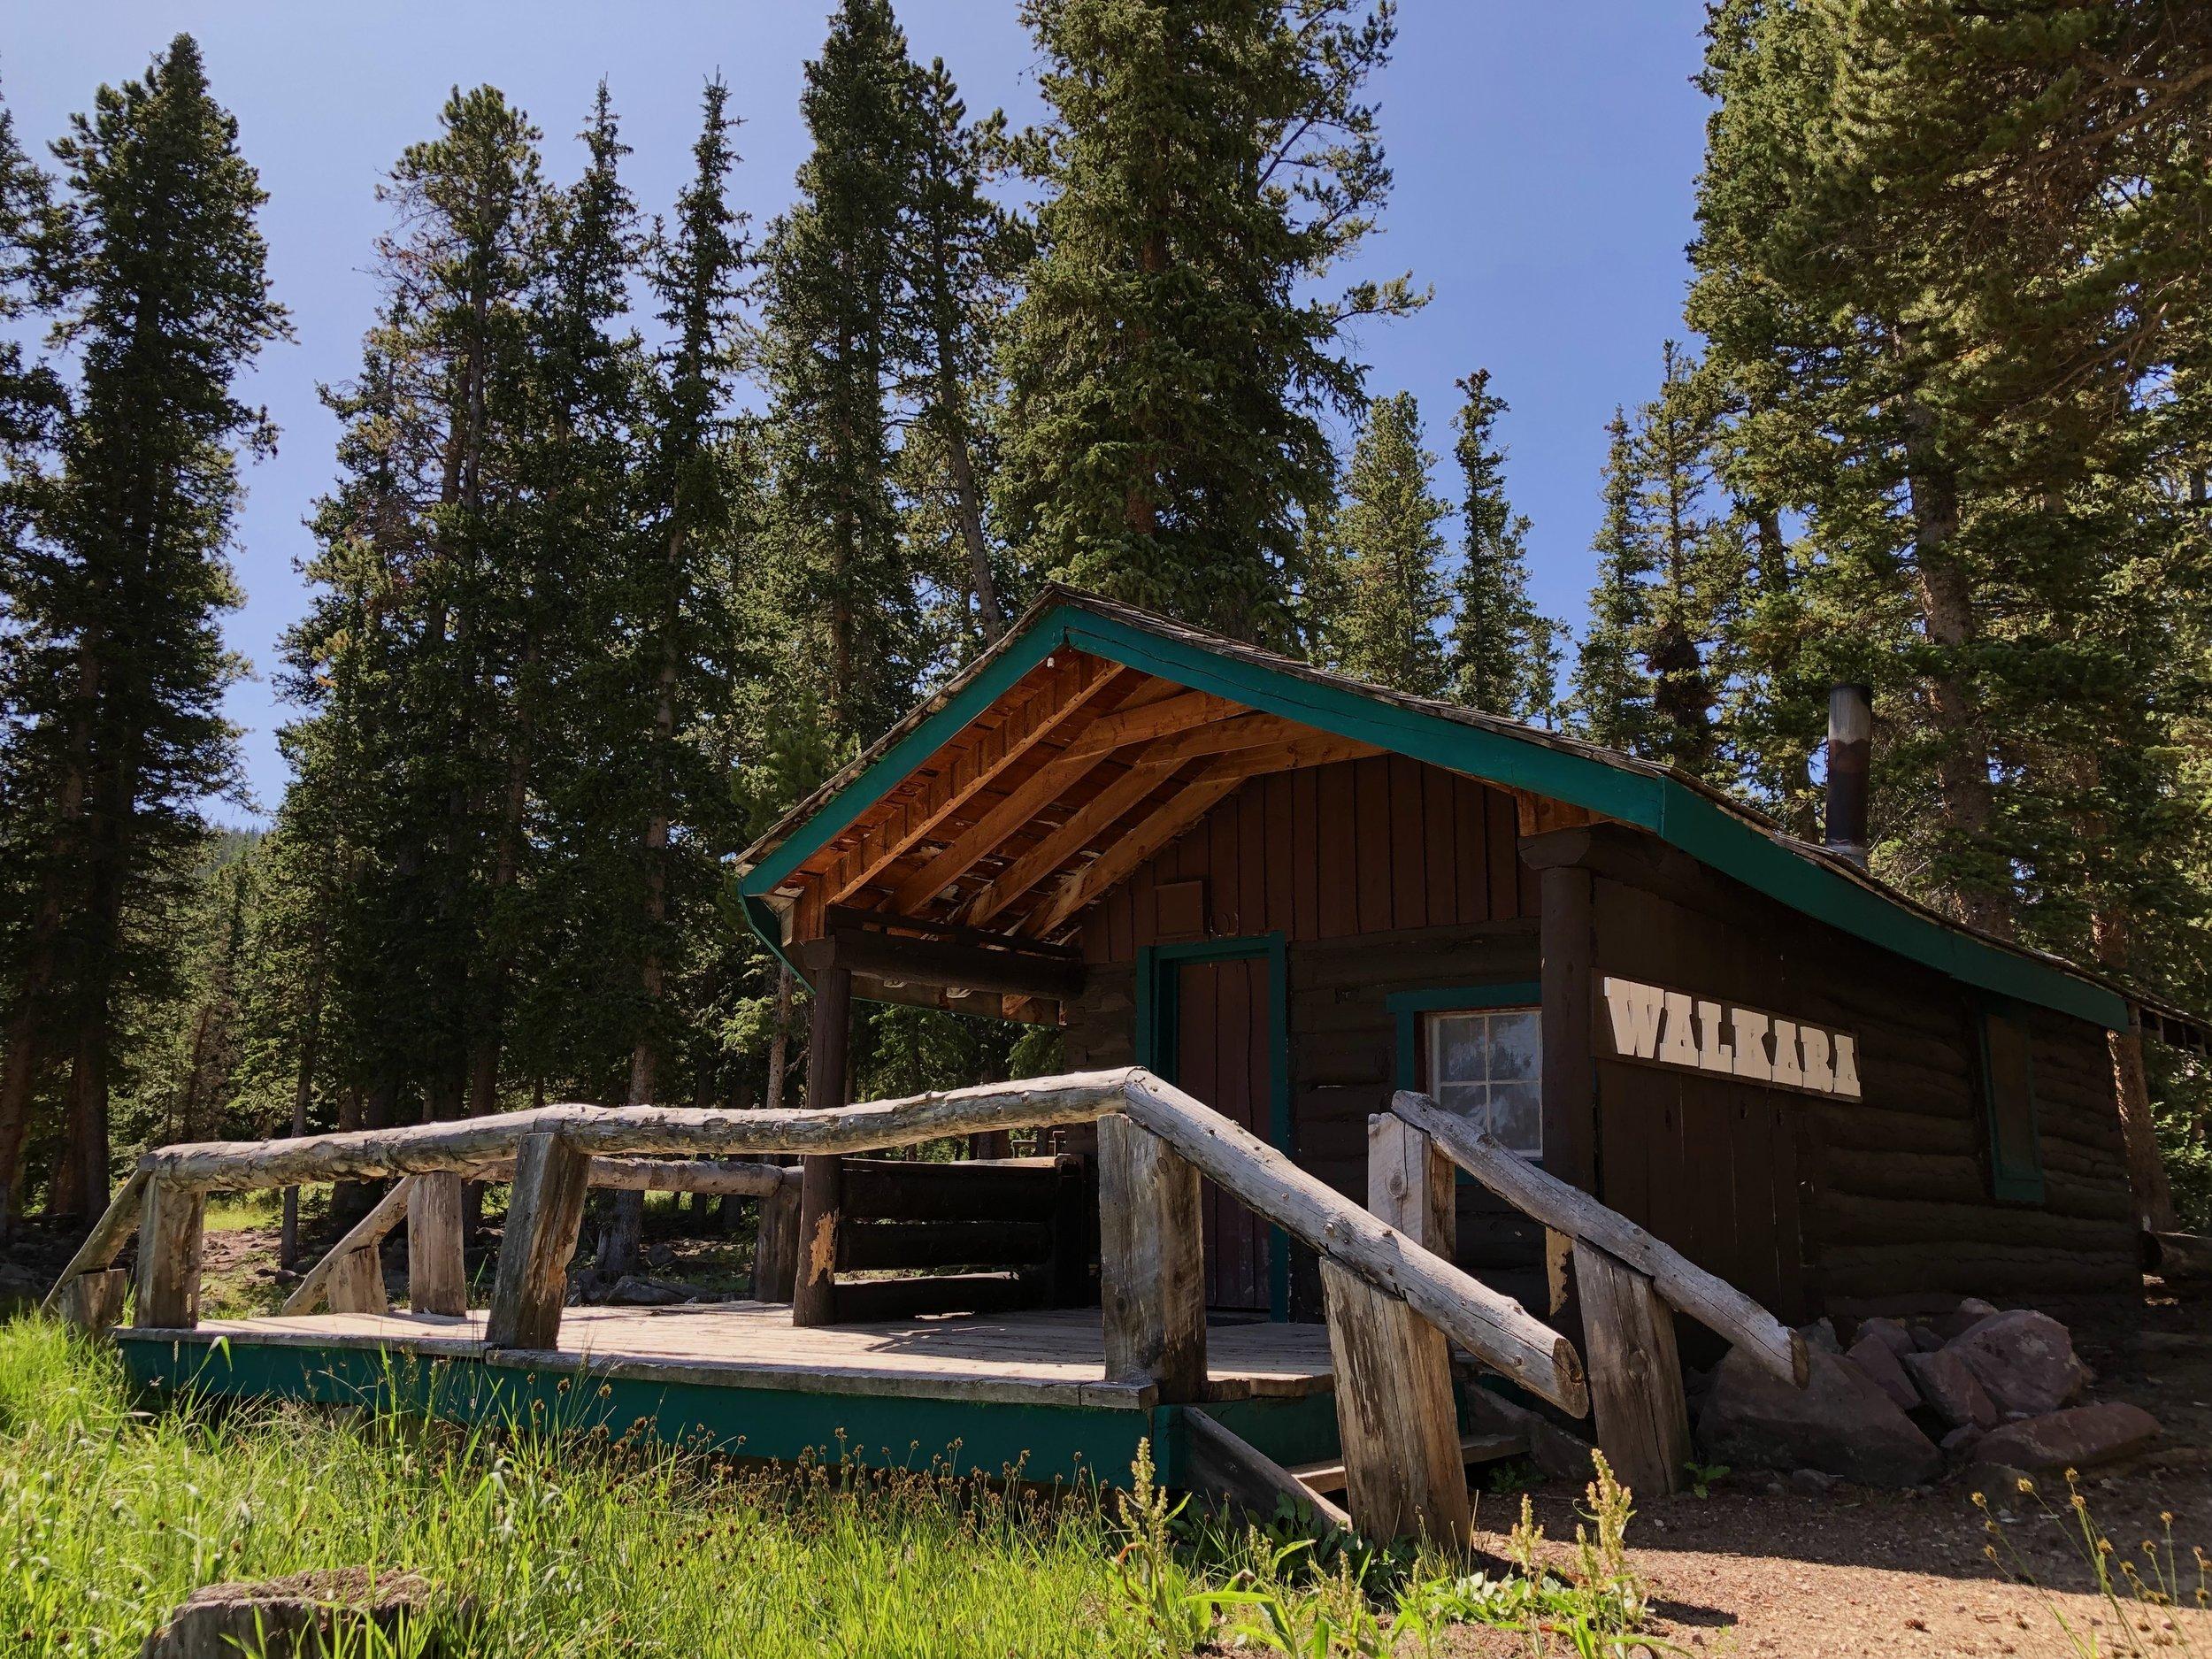 Walkara - Sleeps 4 - 187 sq/ft CabinTwo Full BedsPricingSunday - Thursday | $80/NightFriday & Saturday | $95/Night